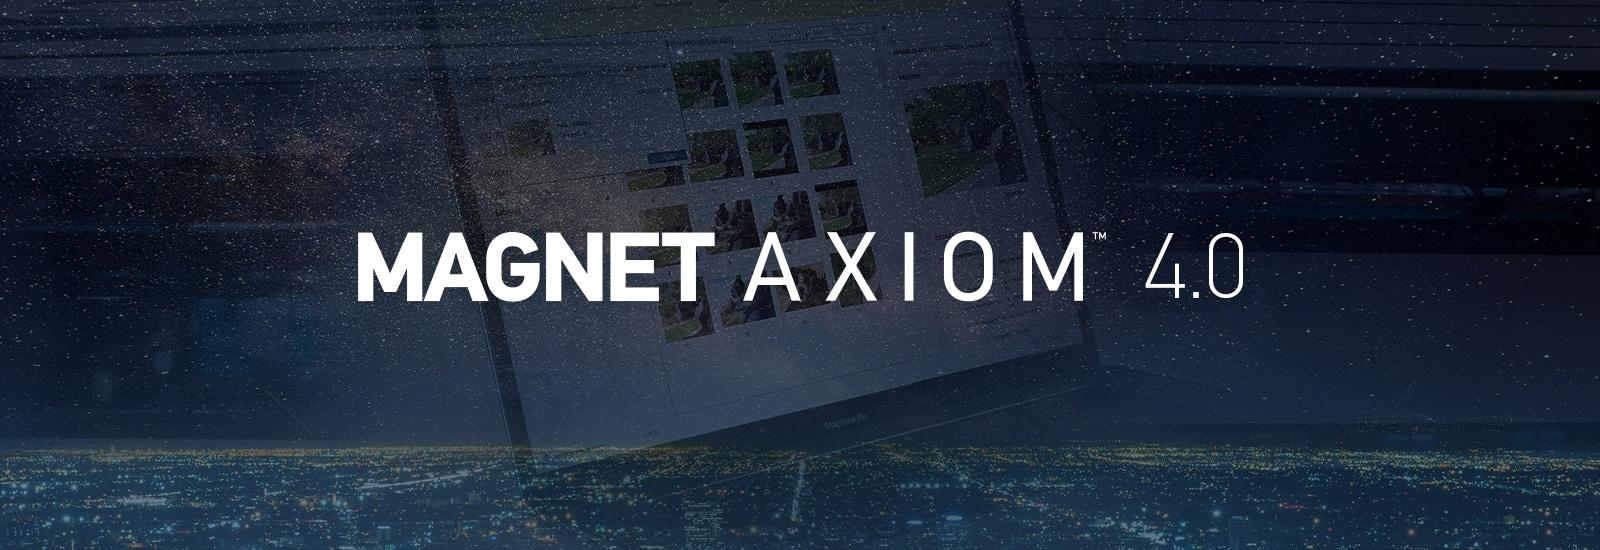 Magnet AXIOM 4.0